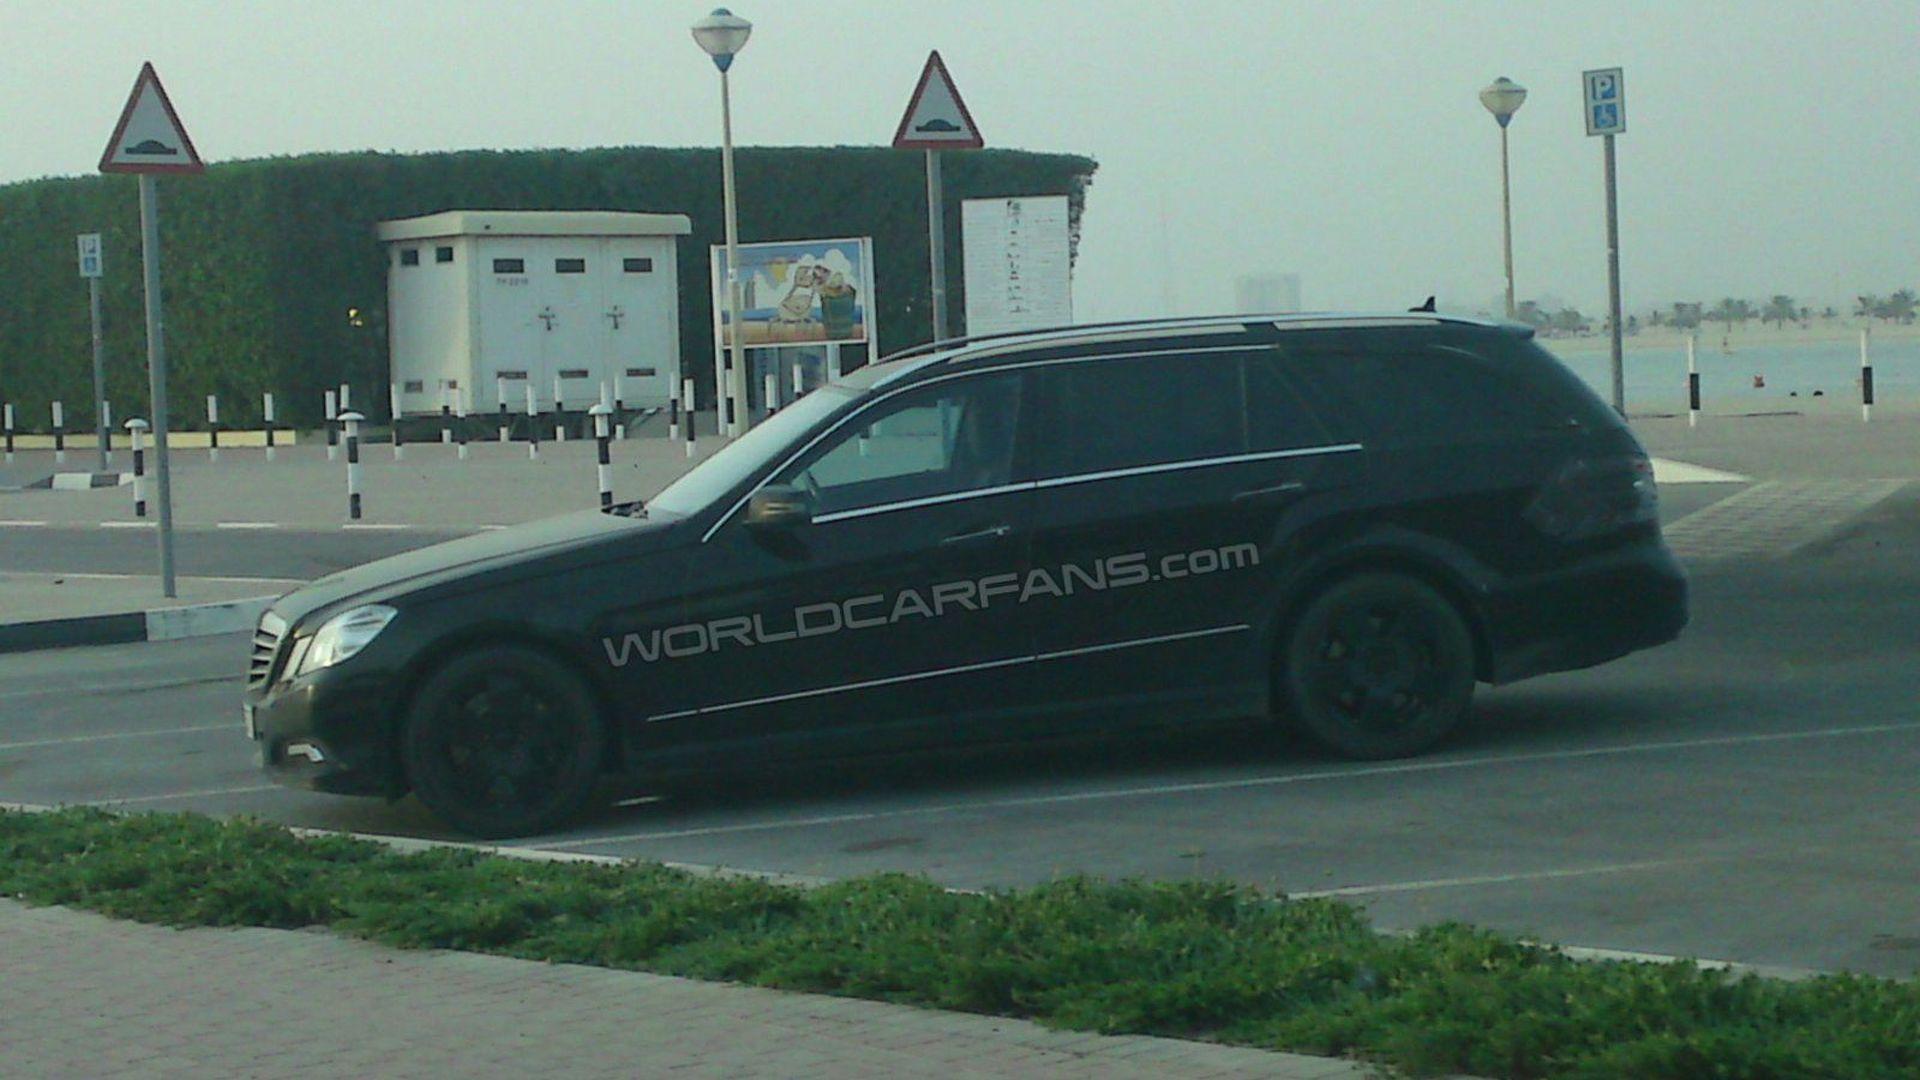 Mercedes E-Class wagon spied in Dubai by WCF reader